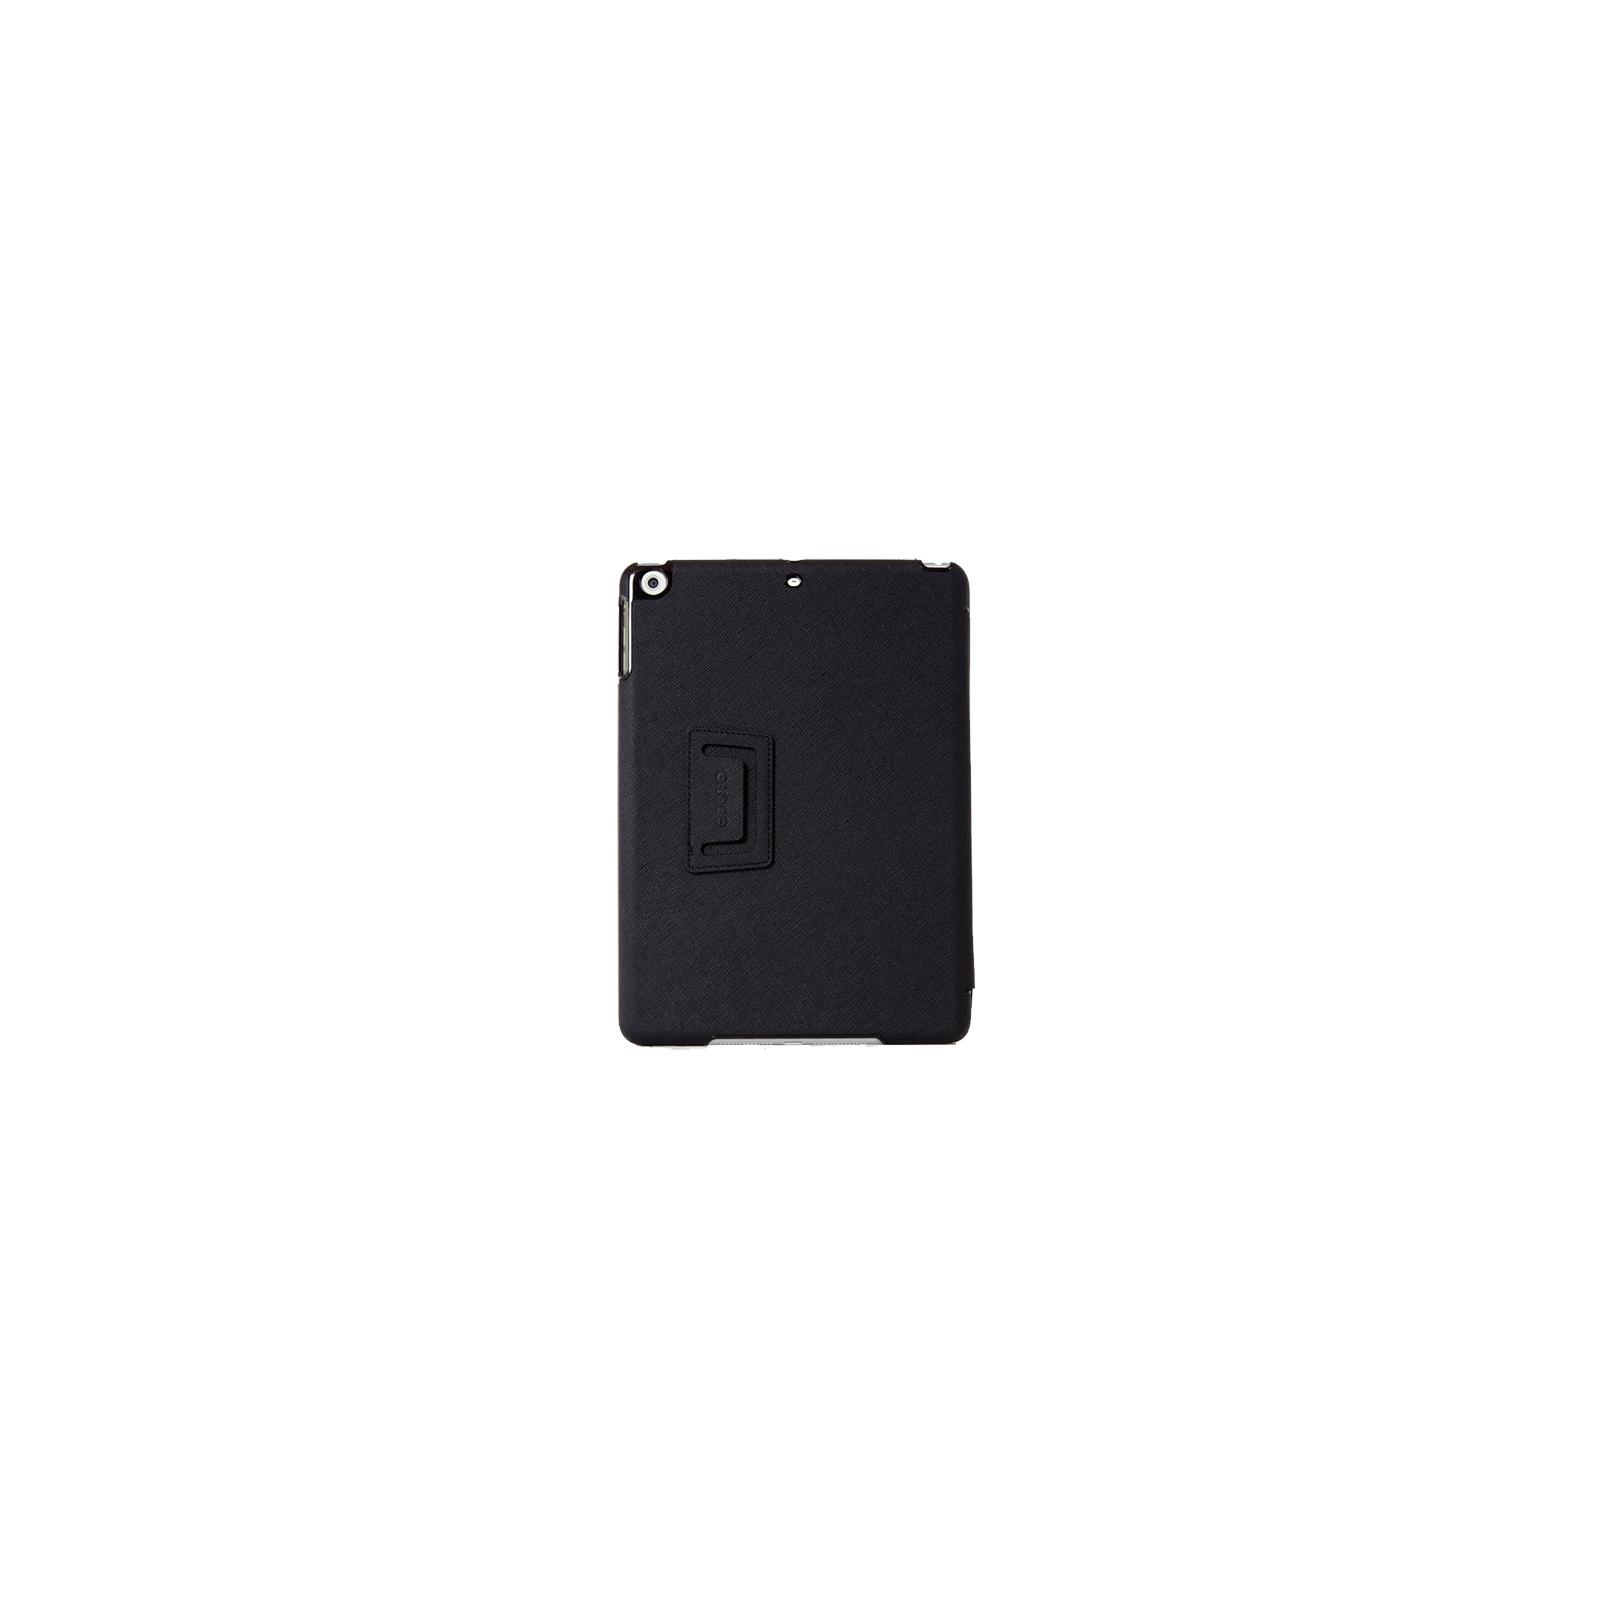 Чехол для планшета ODOYO IPAD AIR /AIRCOAT FOLIO NOIR BLACK (PA532BK) изображение 3